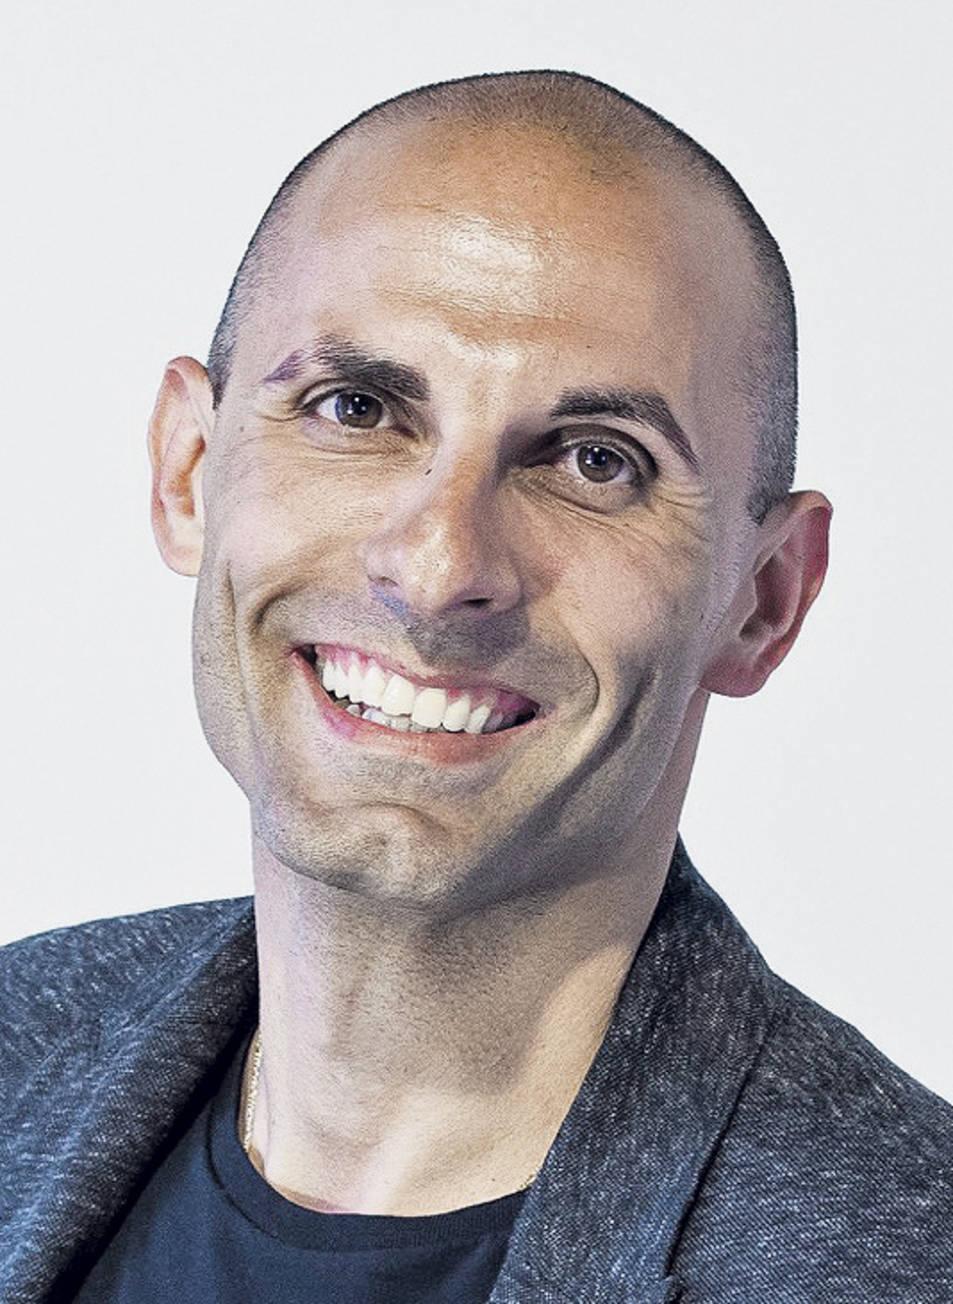 Jordi Salvadó Rius